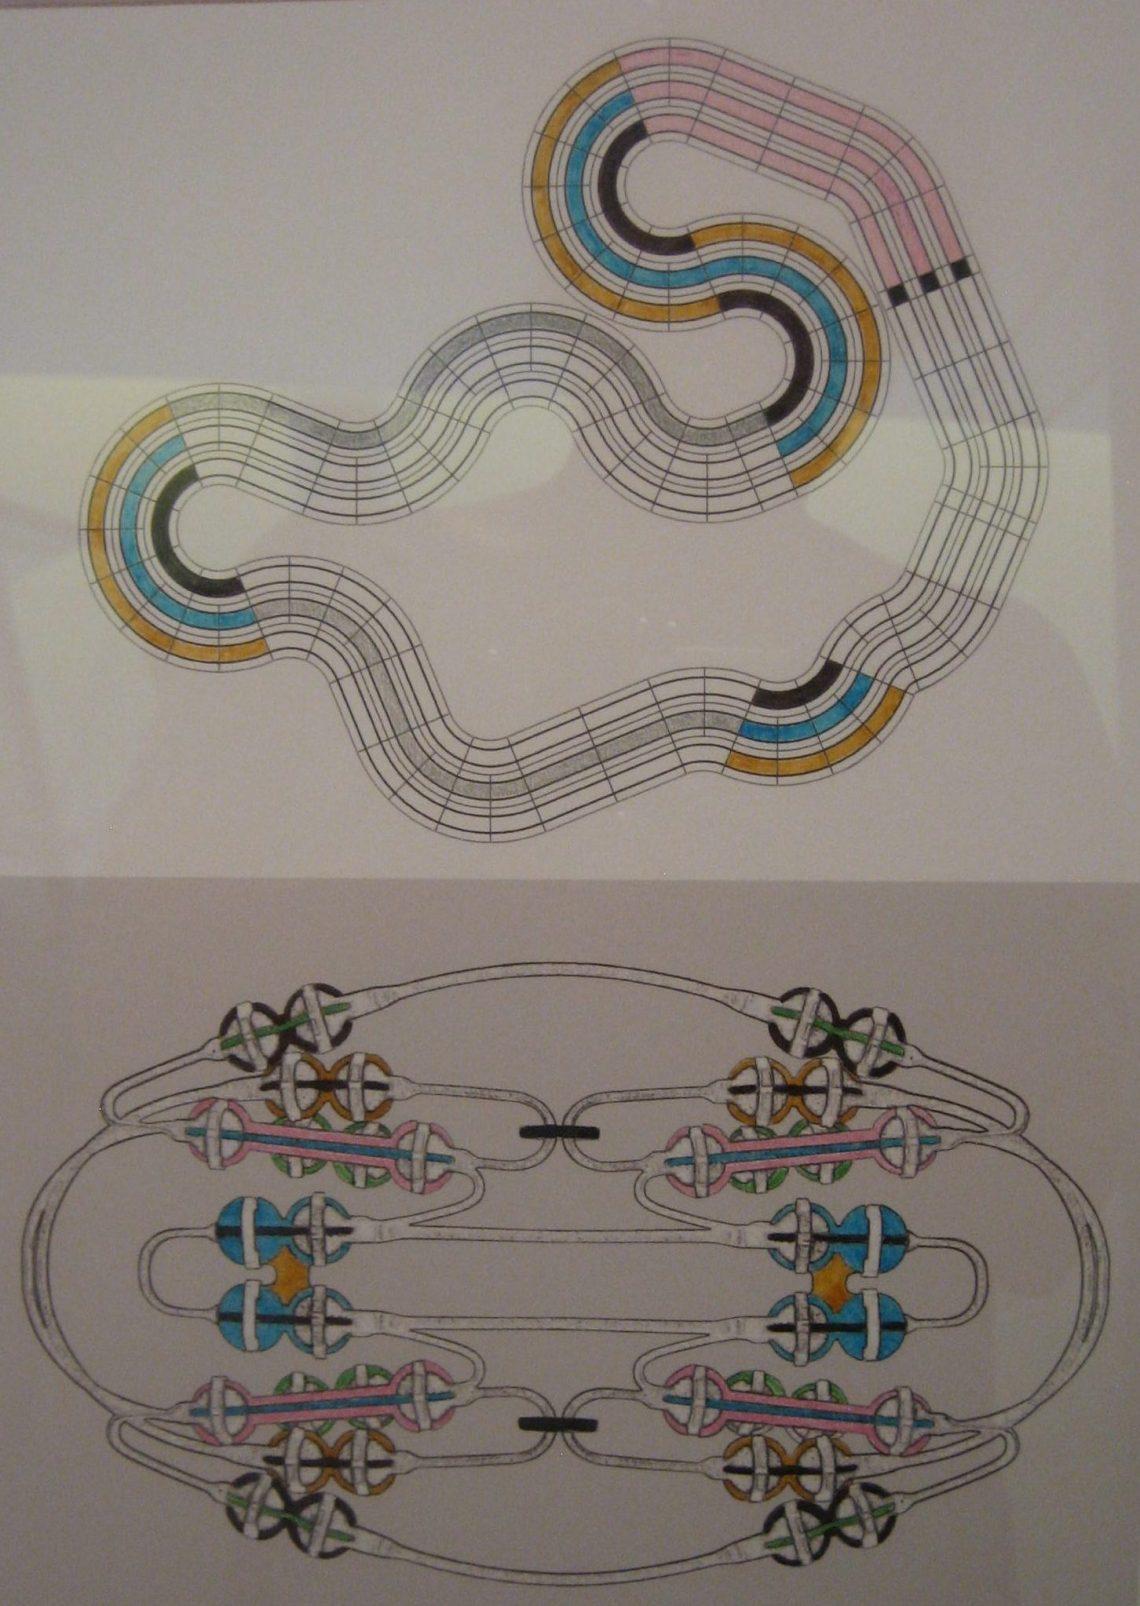 Svenja John, tekening, 2015-2018. Future Form, CODA, 2018. Foto Esther Doornbusch, 25 juli 2018, CC BY 4.0